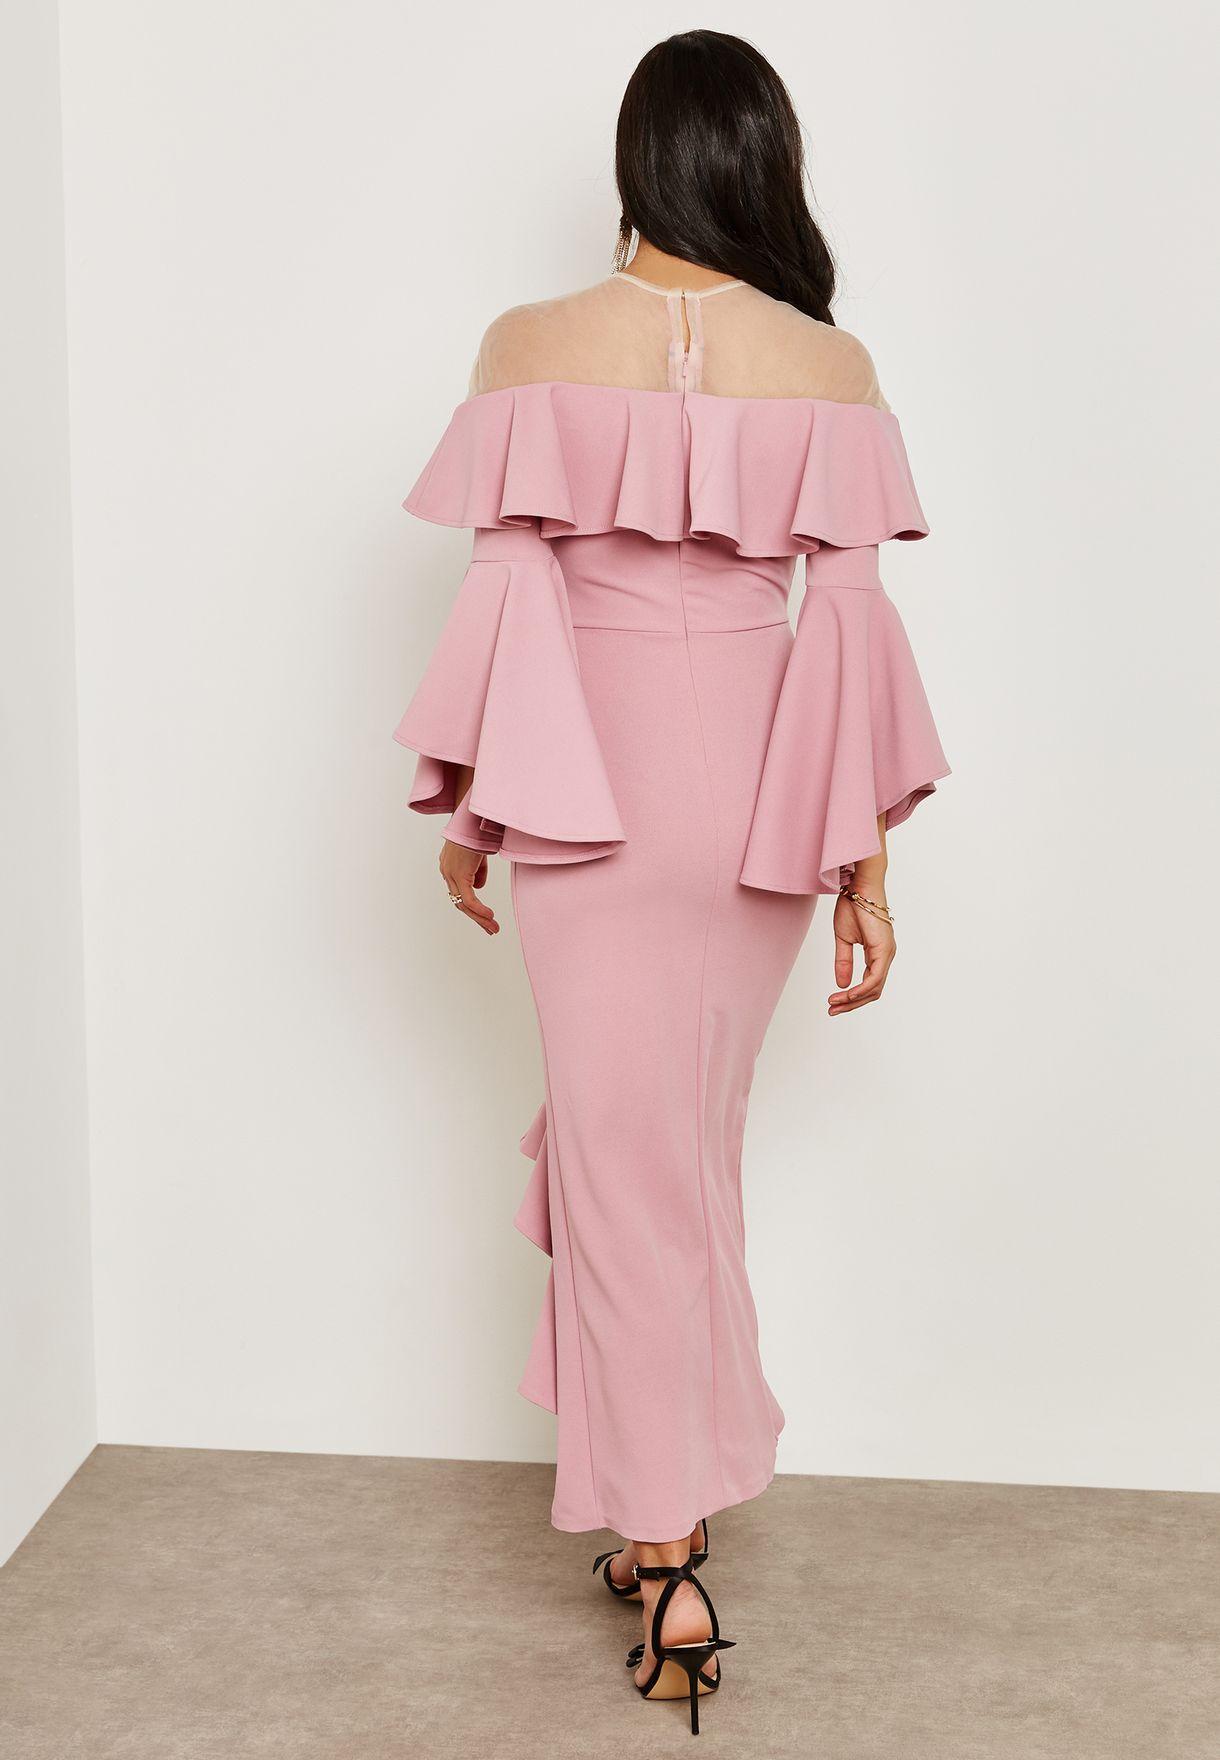 Mesh Top Frill Front Dress